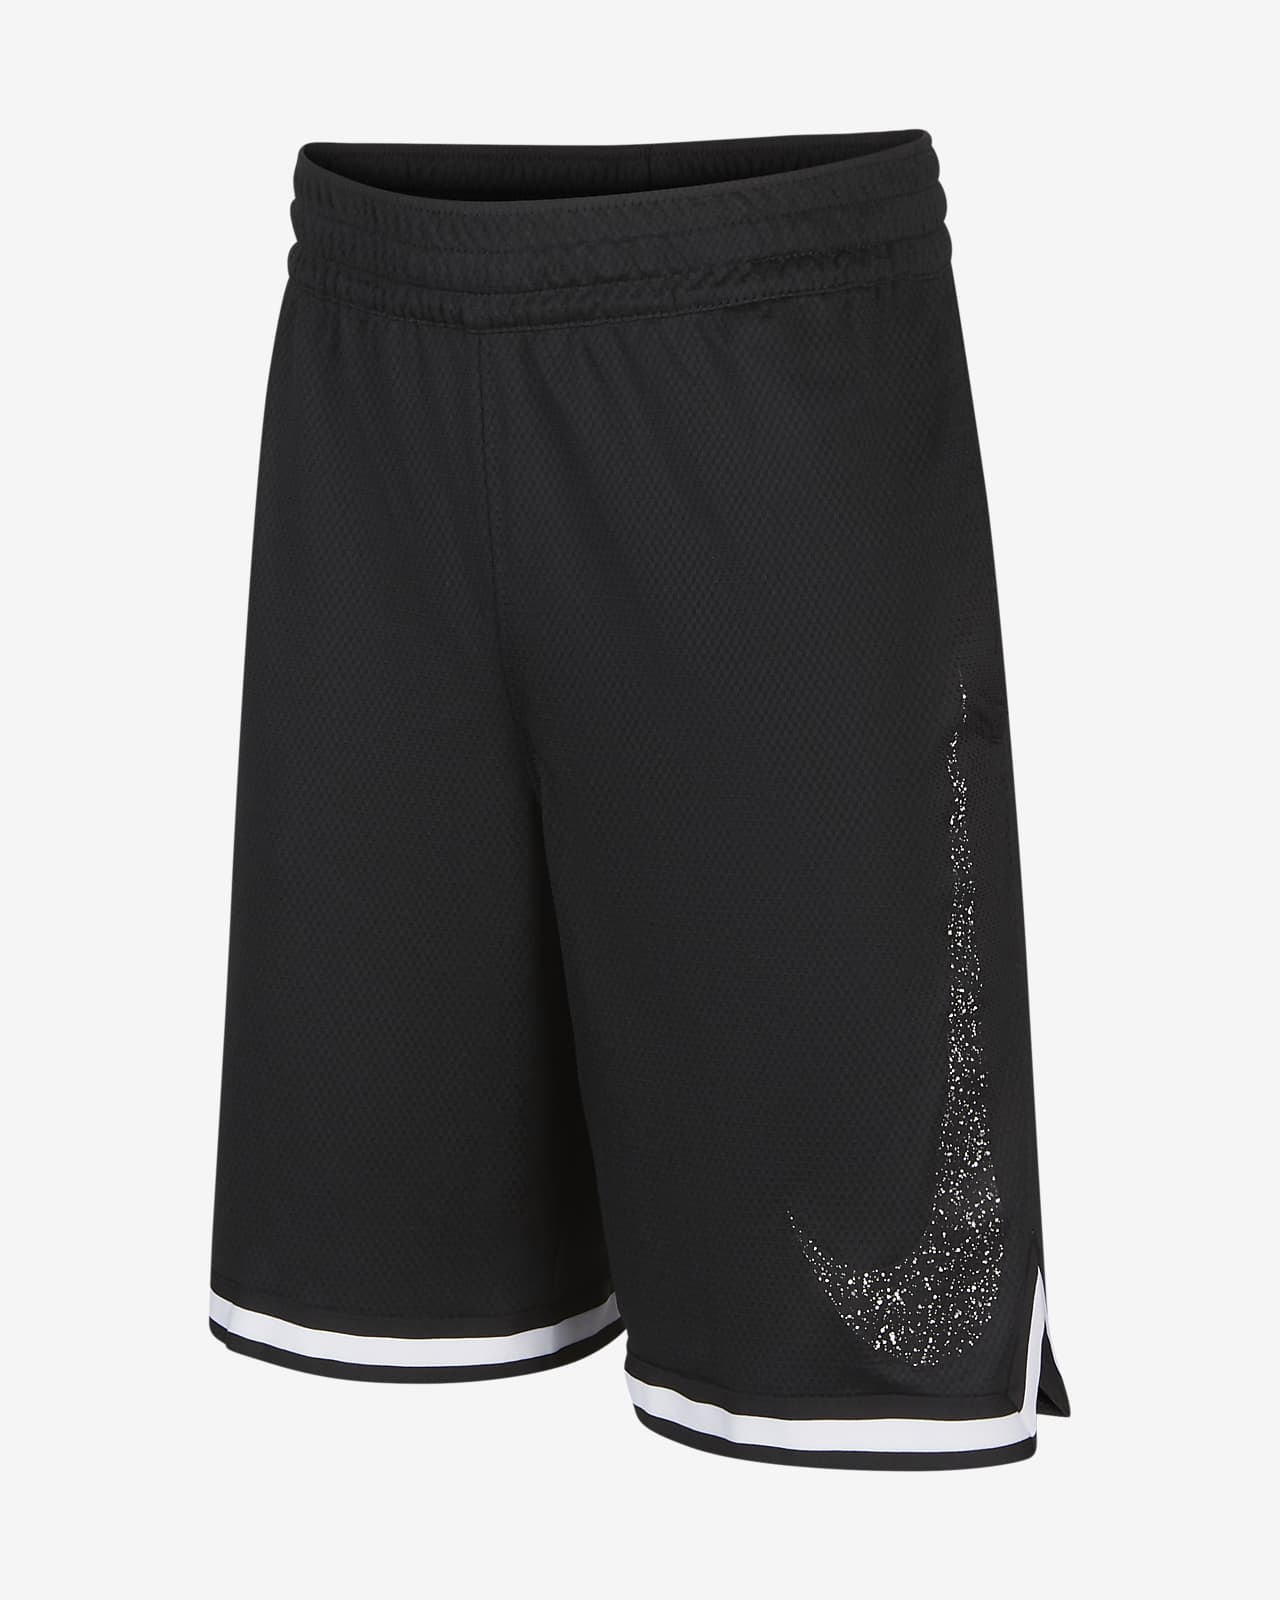 Nike Dri-FIT KP DNA Older Kids' (Boys') Training Shorts